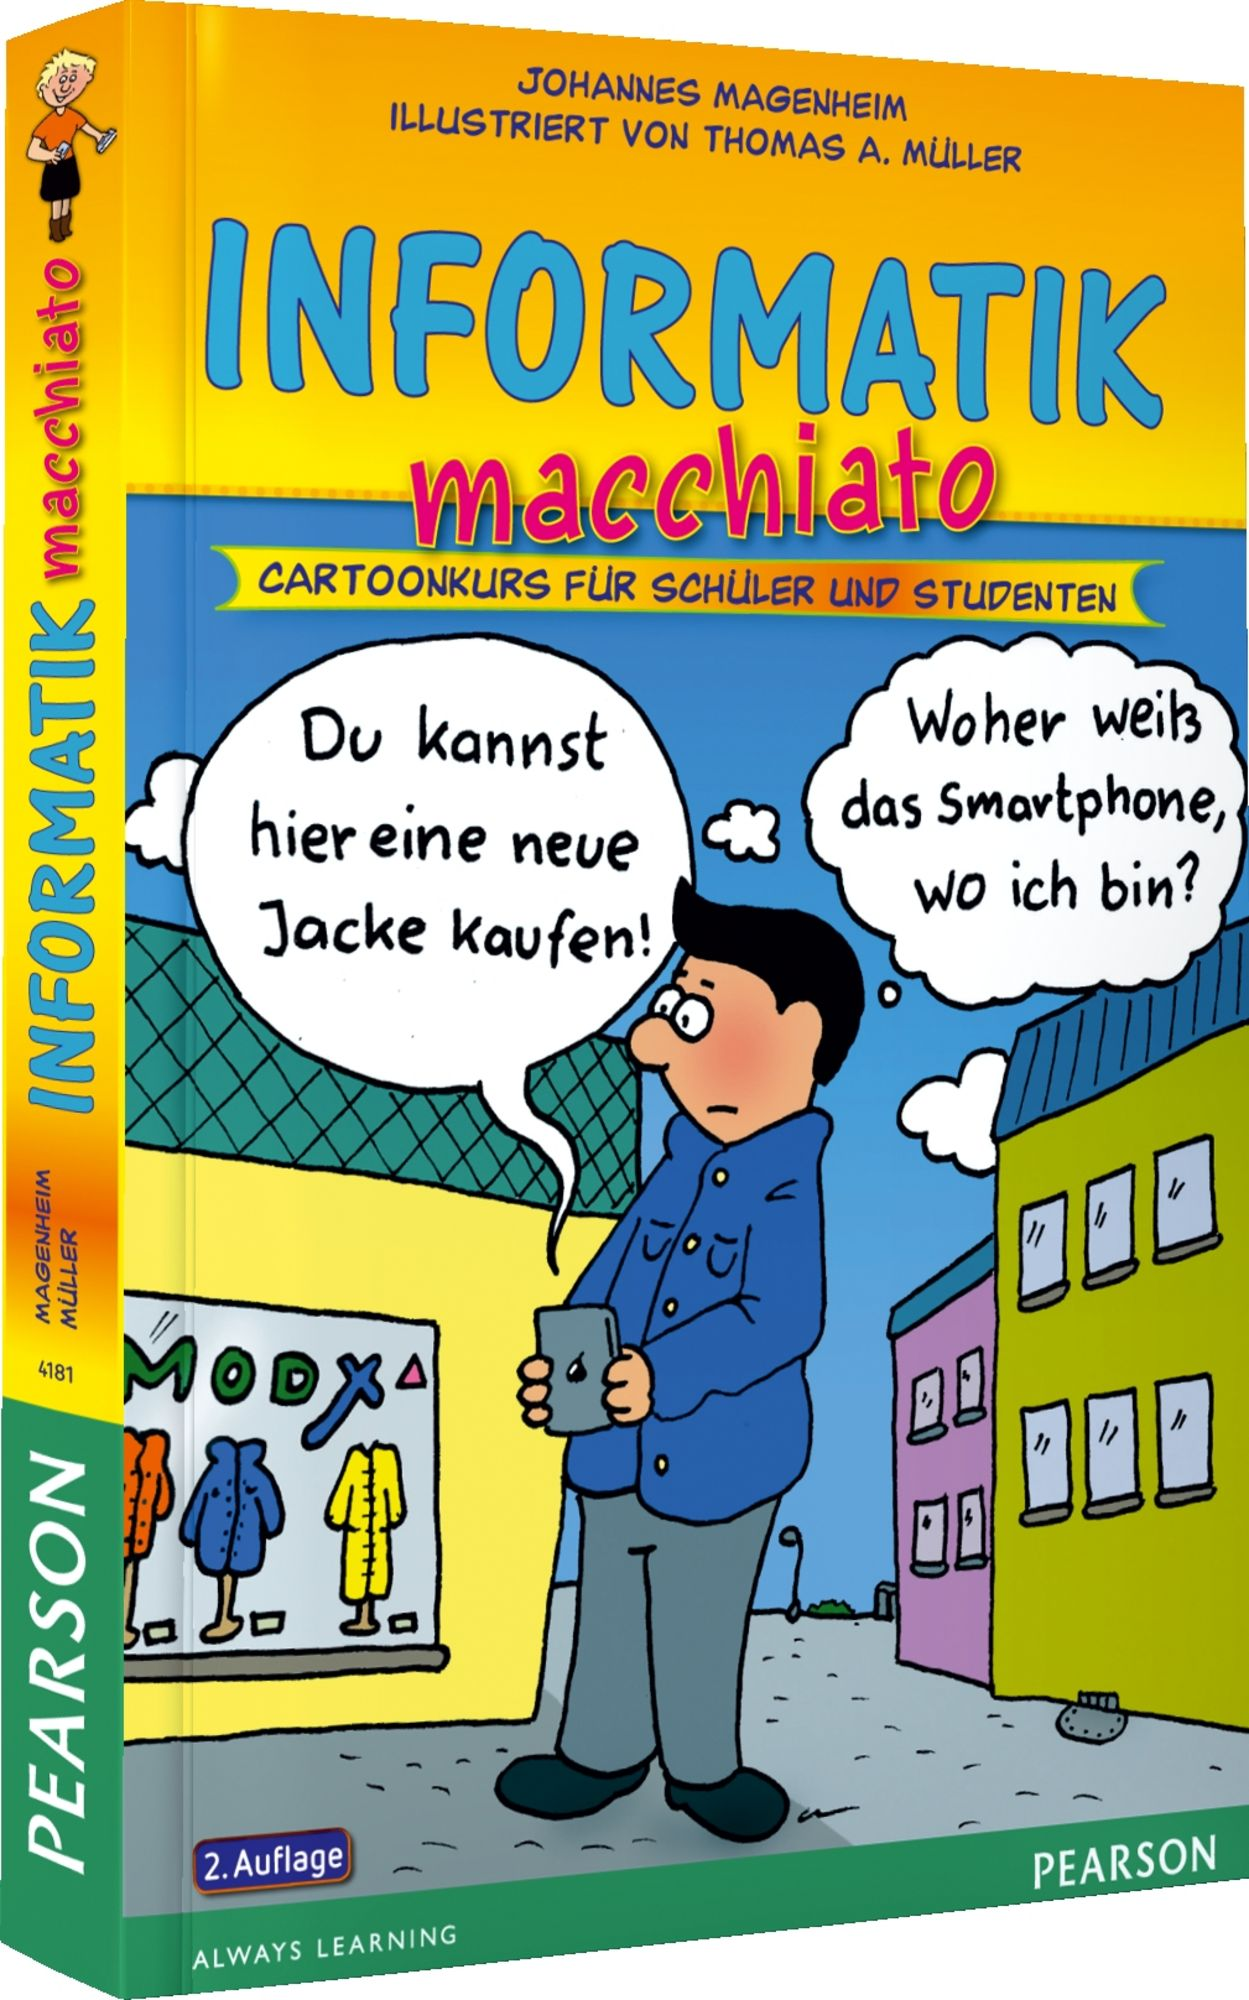 Informatik macchiato - Informatik macchiato: Ca...